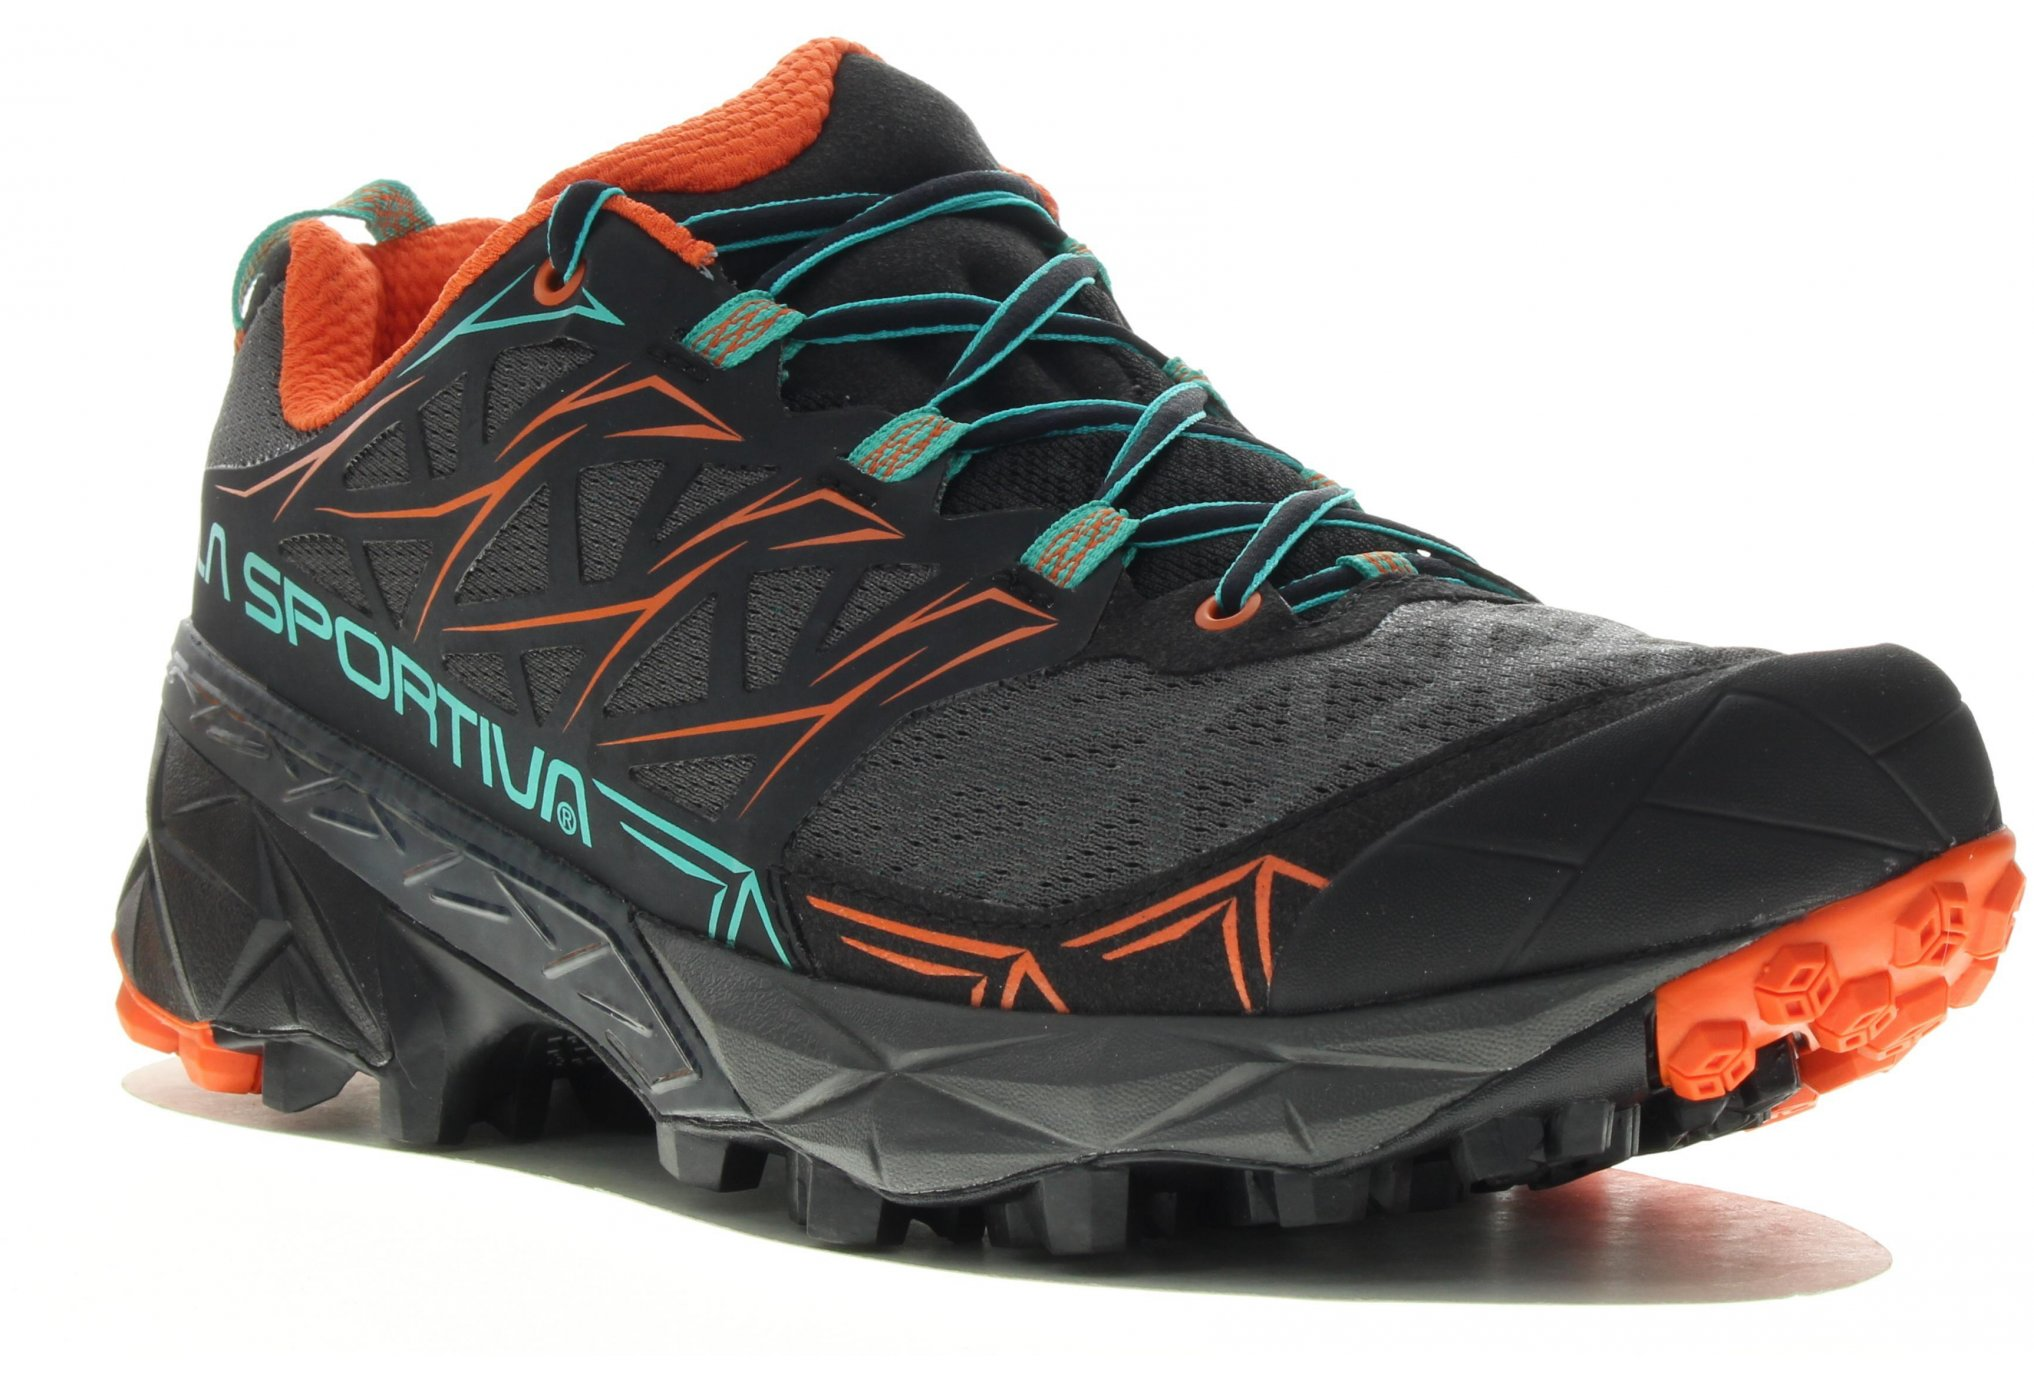 La Sportiva Akyra Chaussures running femme